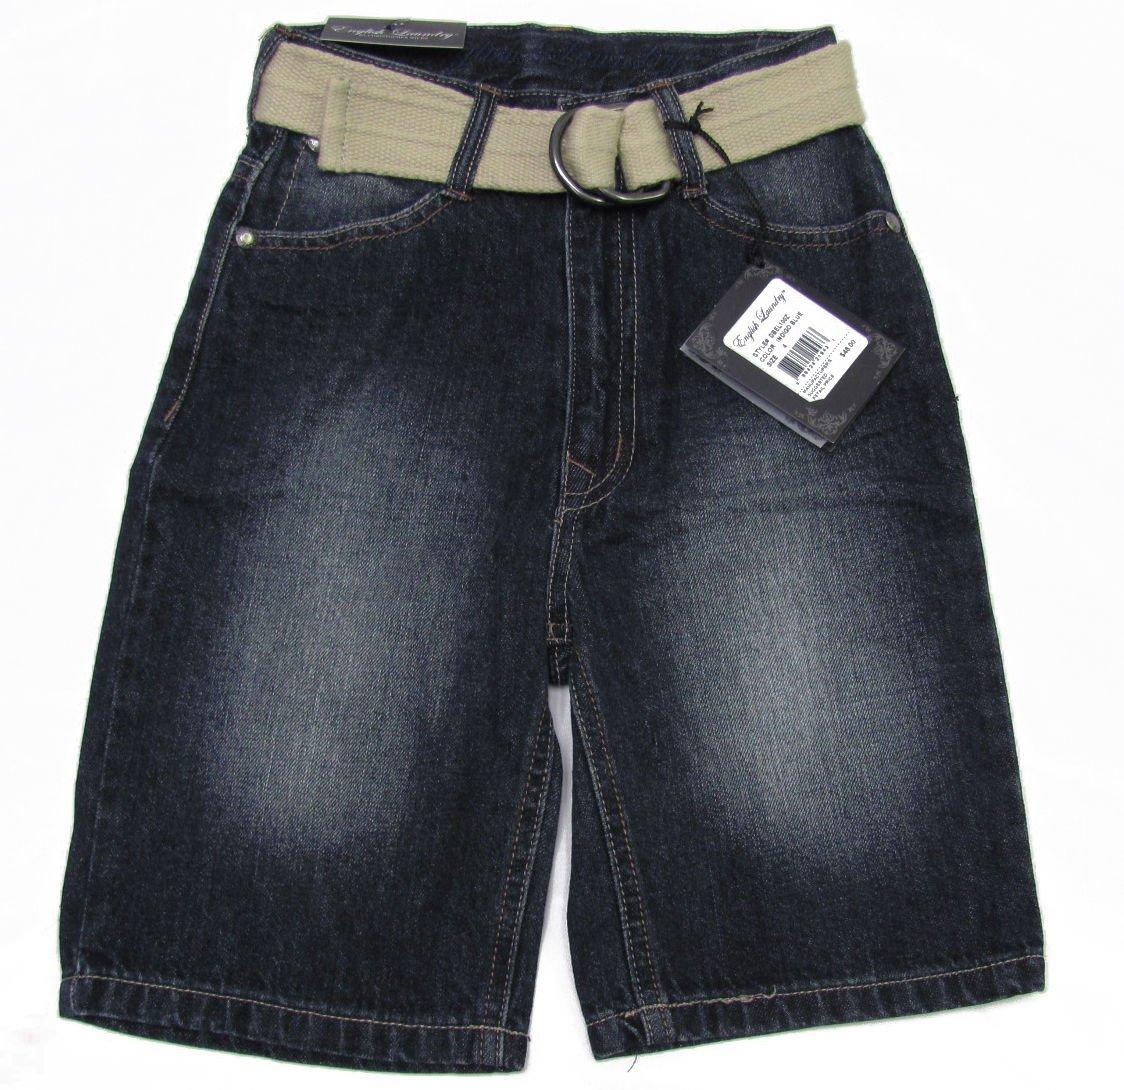 English Laundry Boys size 4 Dark Blue Jean Shorts with Belt New